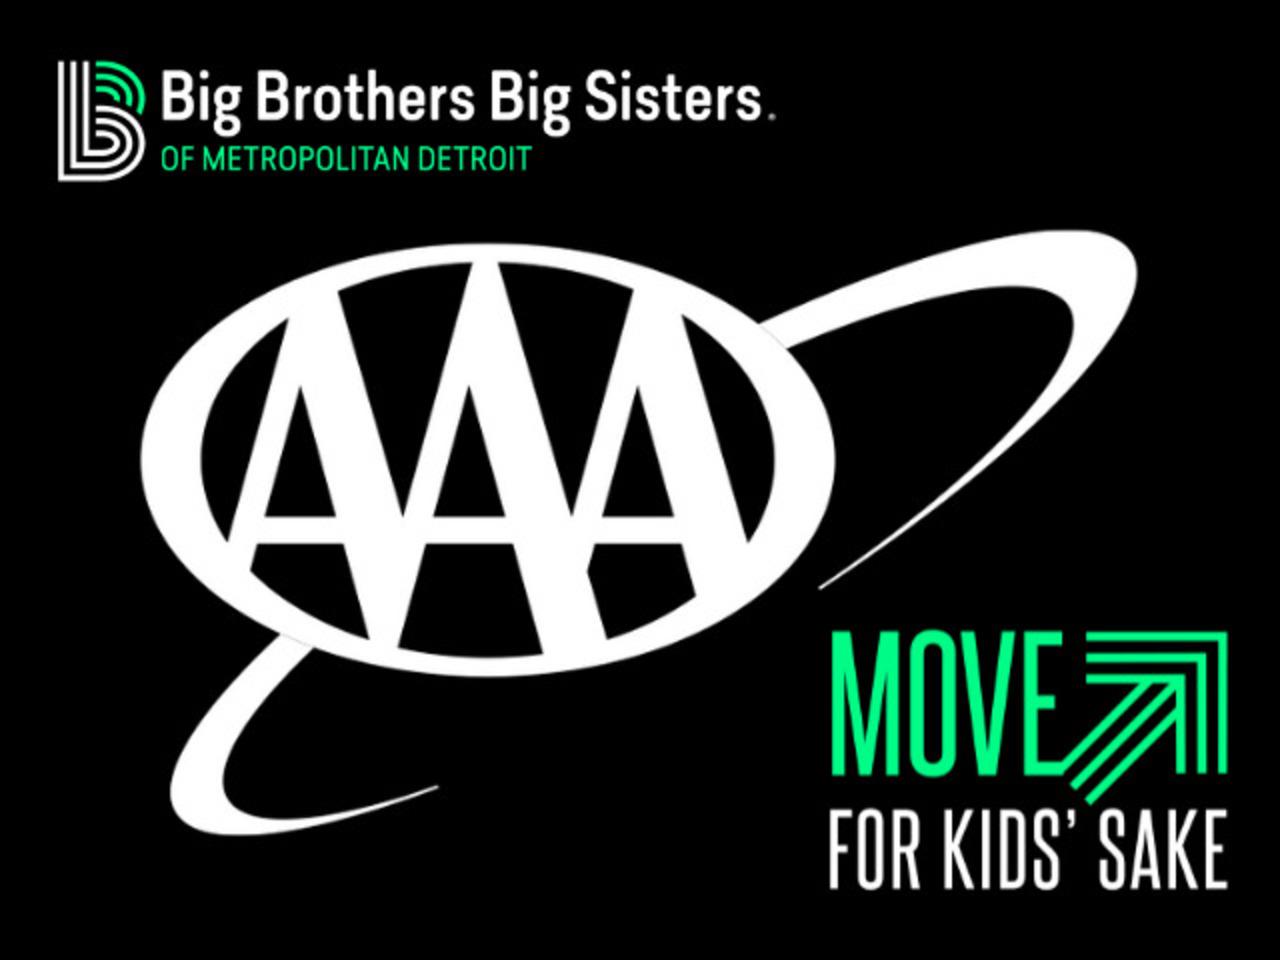 2021 AAA ACG Move For Kids' Sake